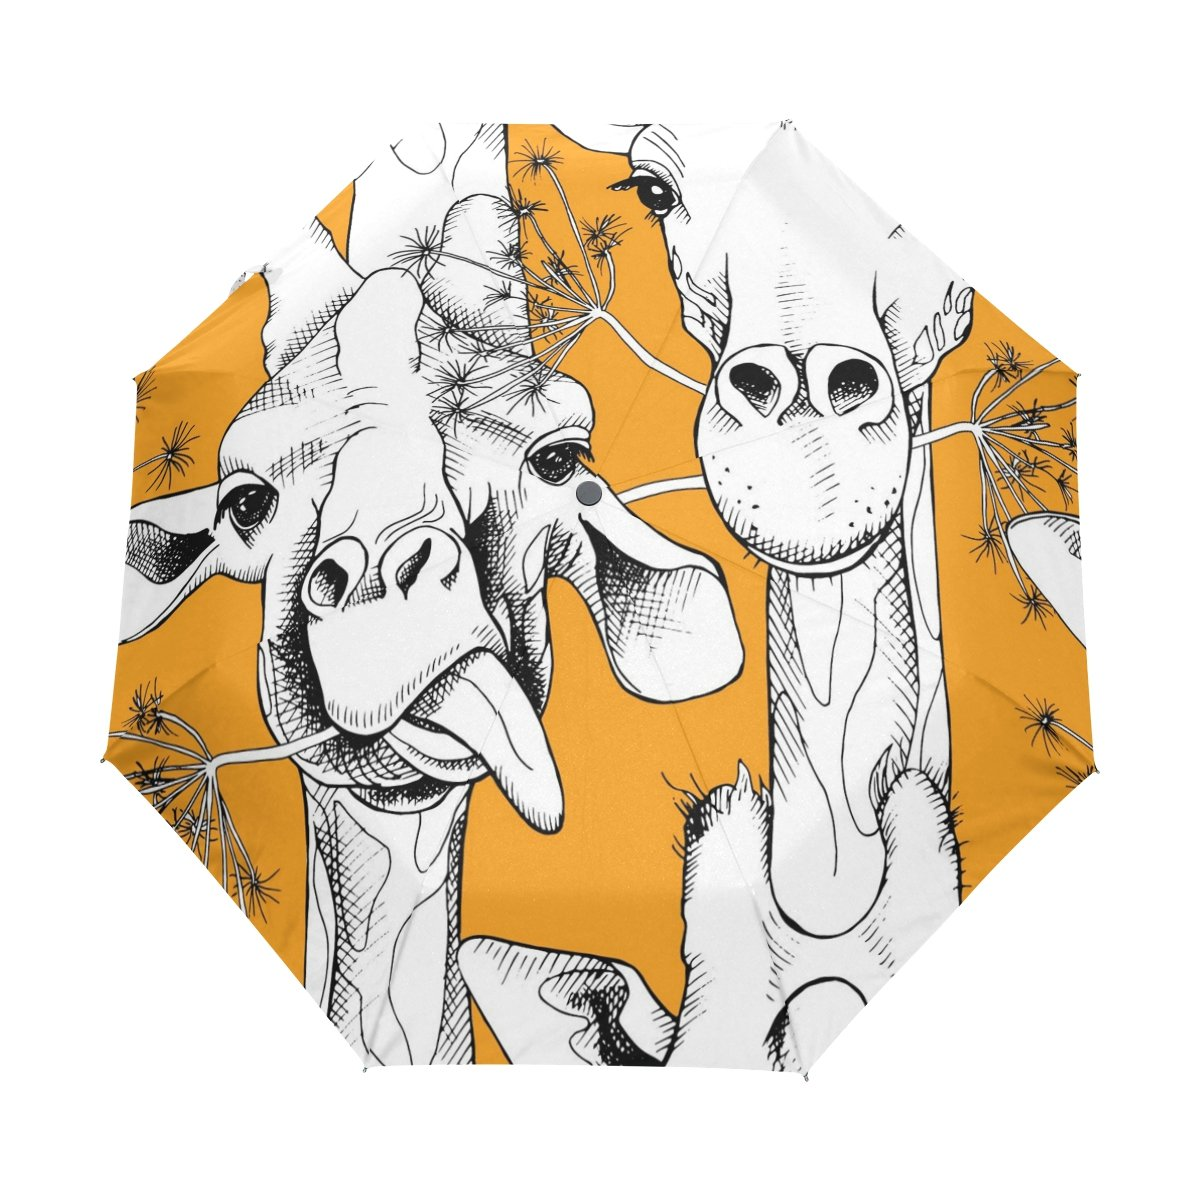 Senya Saobao防風と防雨トラベル傘with自動開いて閉じ折りたたみかわいい鹿オレンジポータブル折りたたみ式太陽雨傘 B07FF3698H